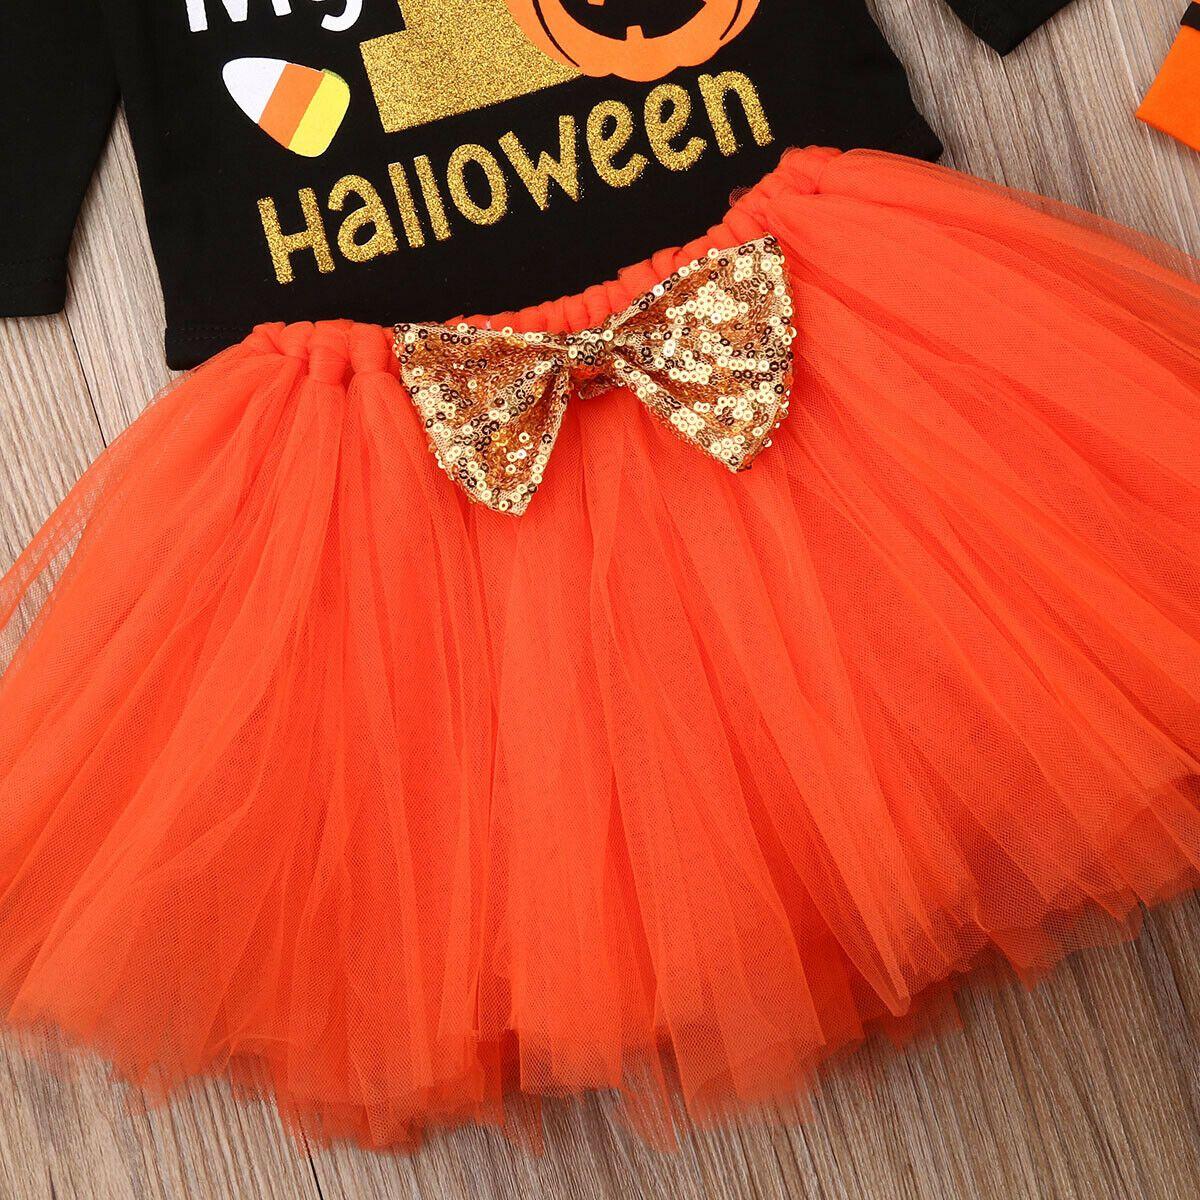 Halloween Baby Girl Pumpkin Romper My 1st Bodysuit Princess Bowknot Tulle Tutu Skirt Leg Warmers Heaband Outfits Set